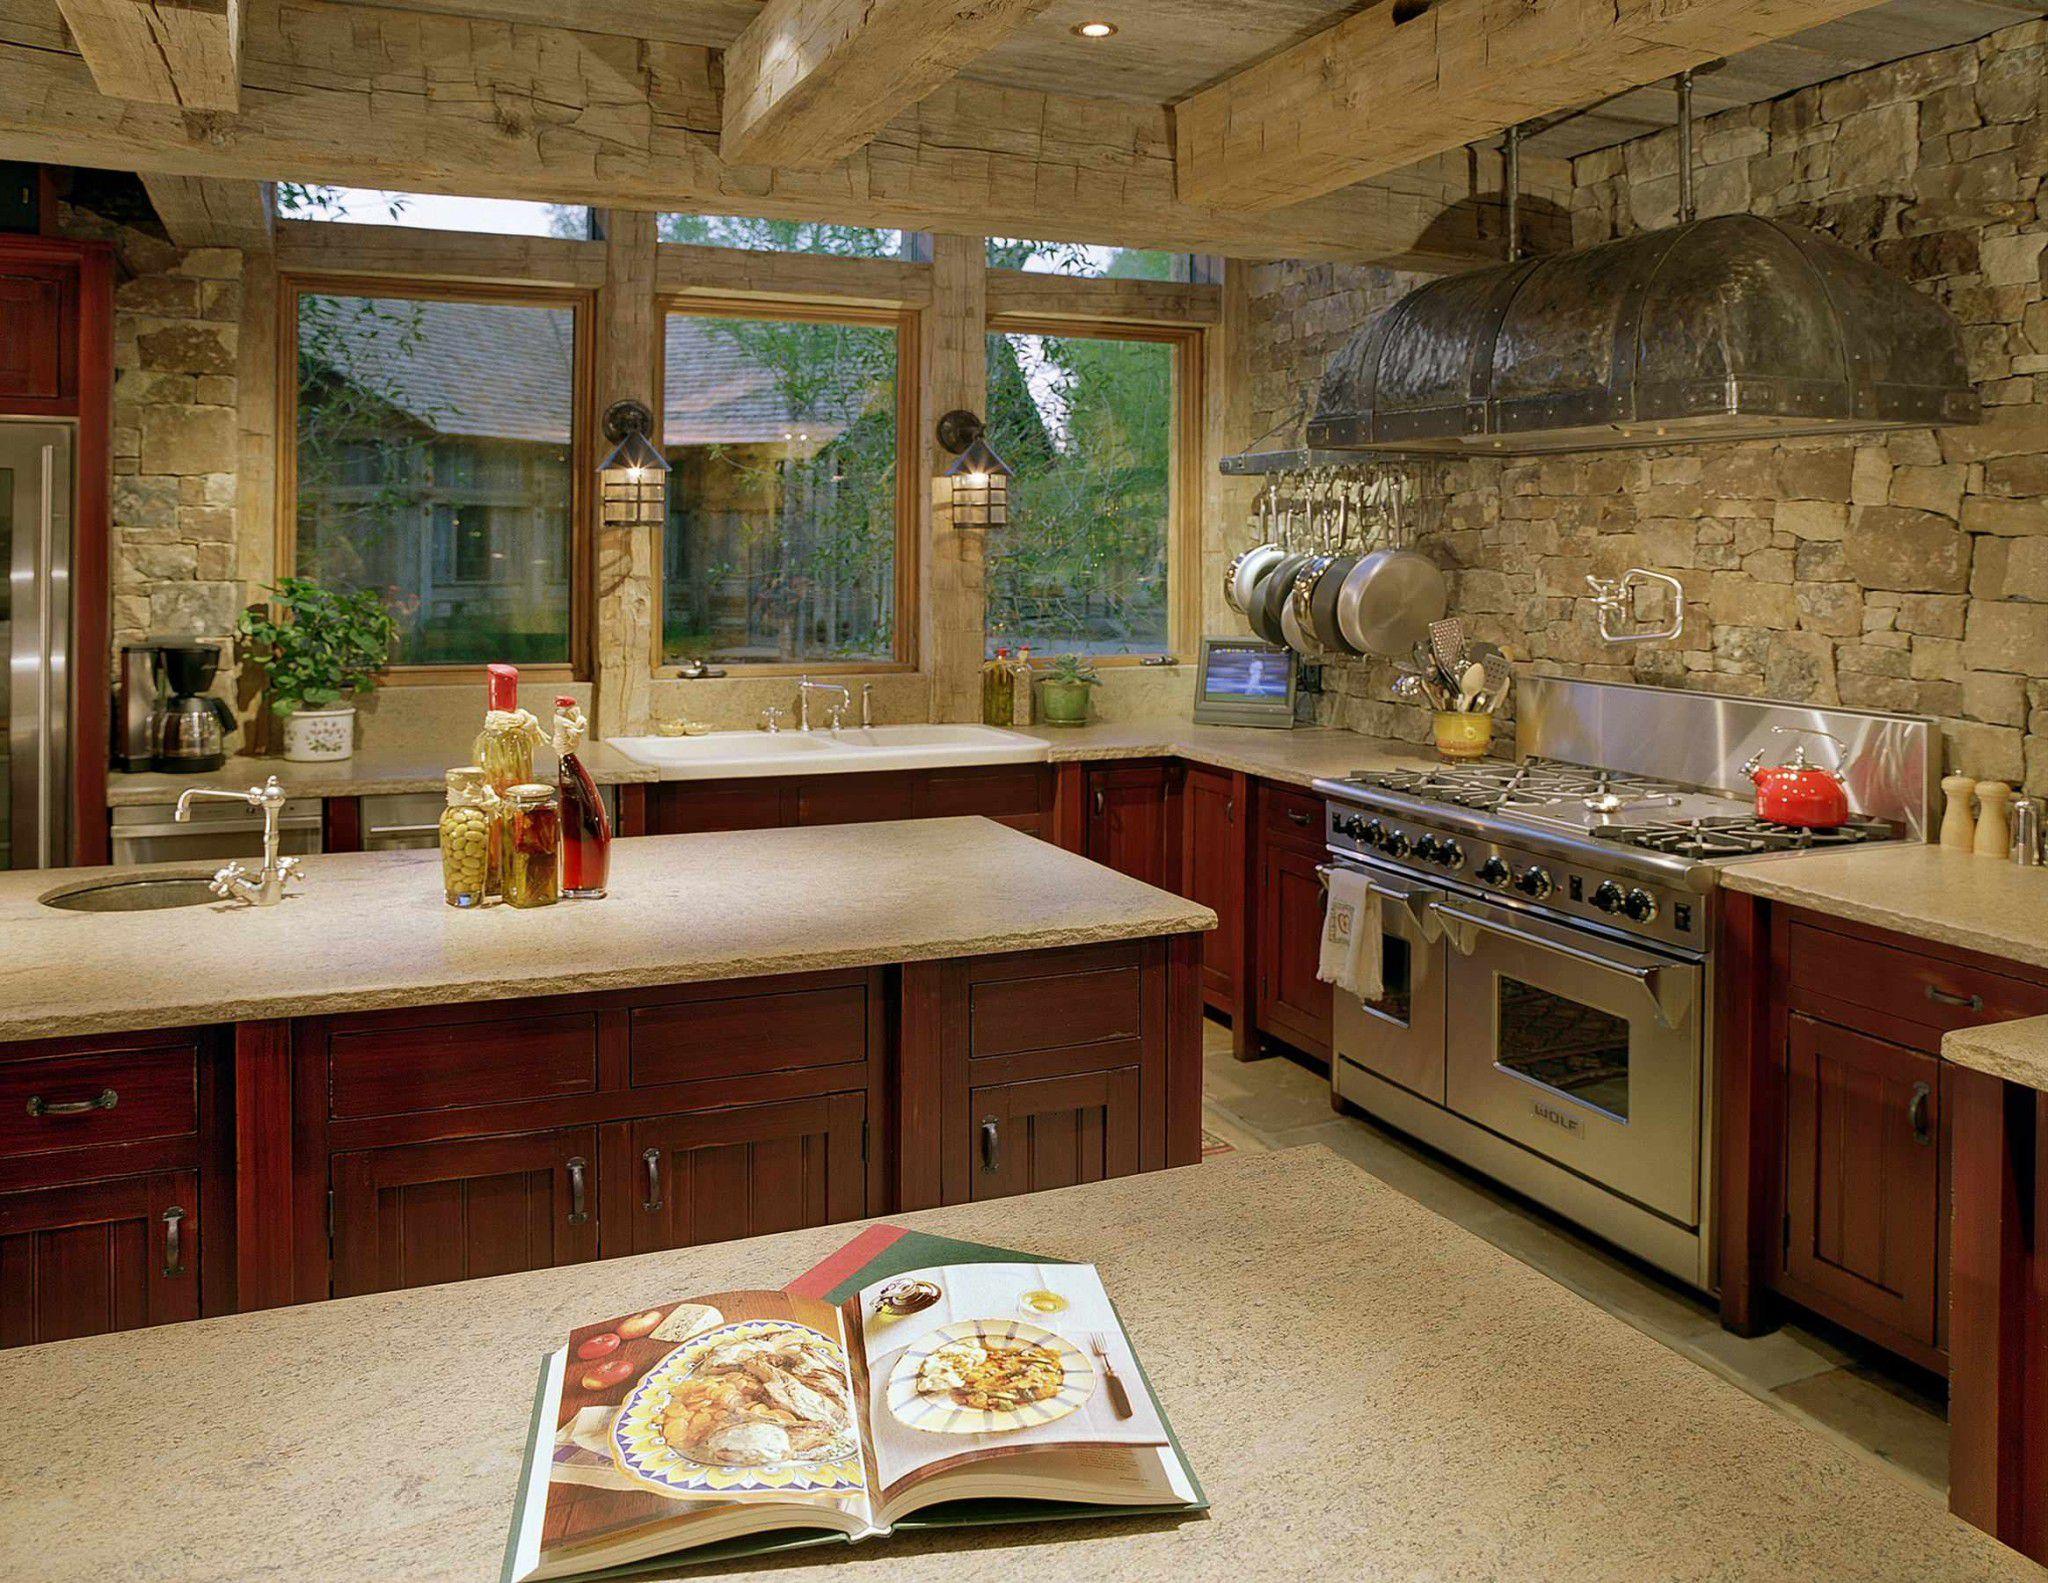 Kitchen Backsplash Ideas30 Rustic Kitchen Backsplash Ideas Click